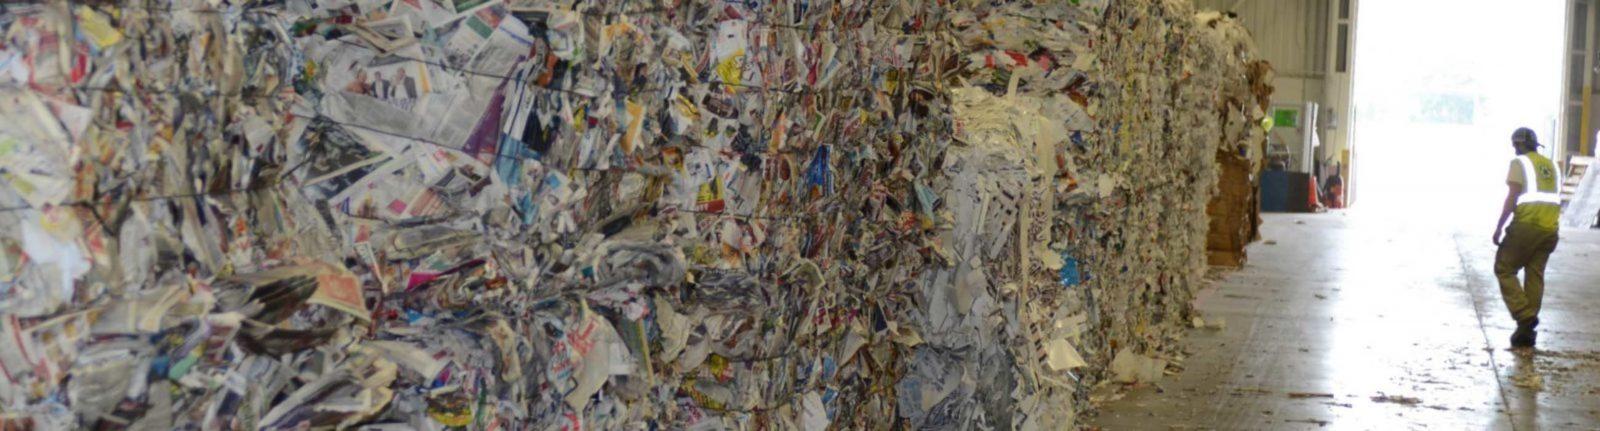 Metal-Recycling-Dallas_TxR-Slider-Paper-Plant